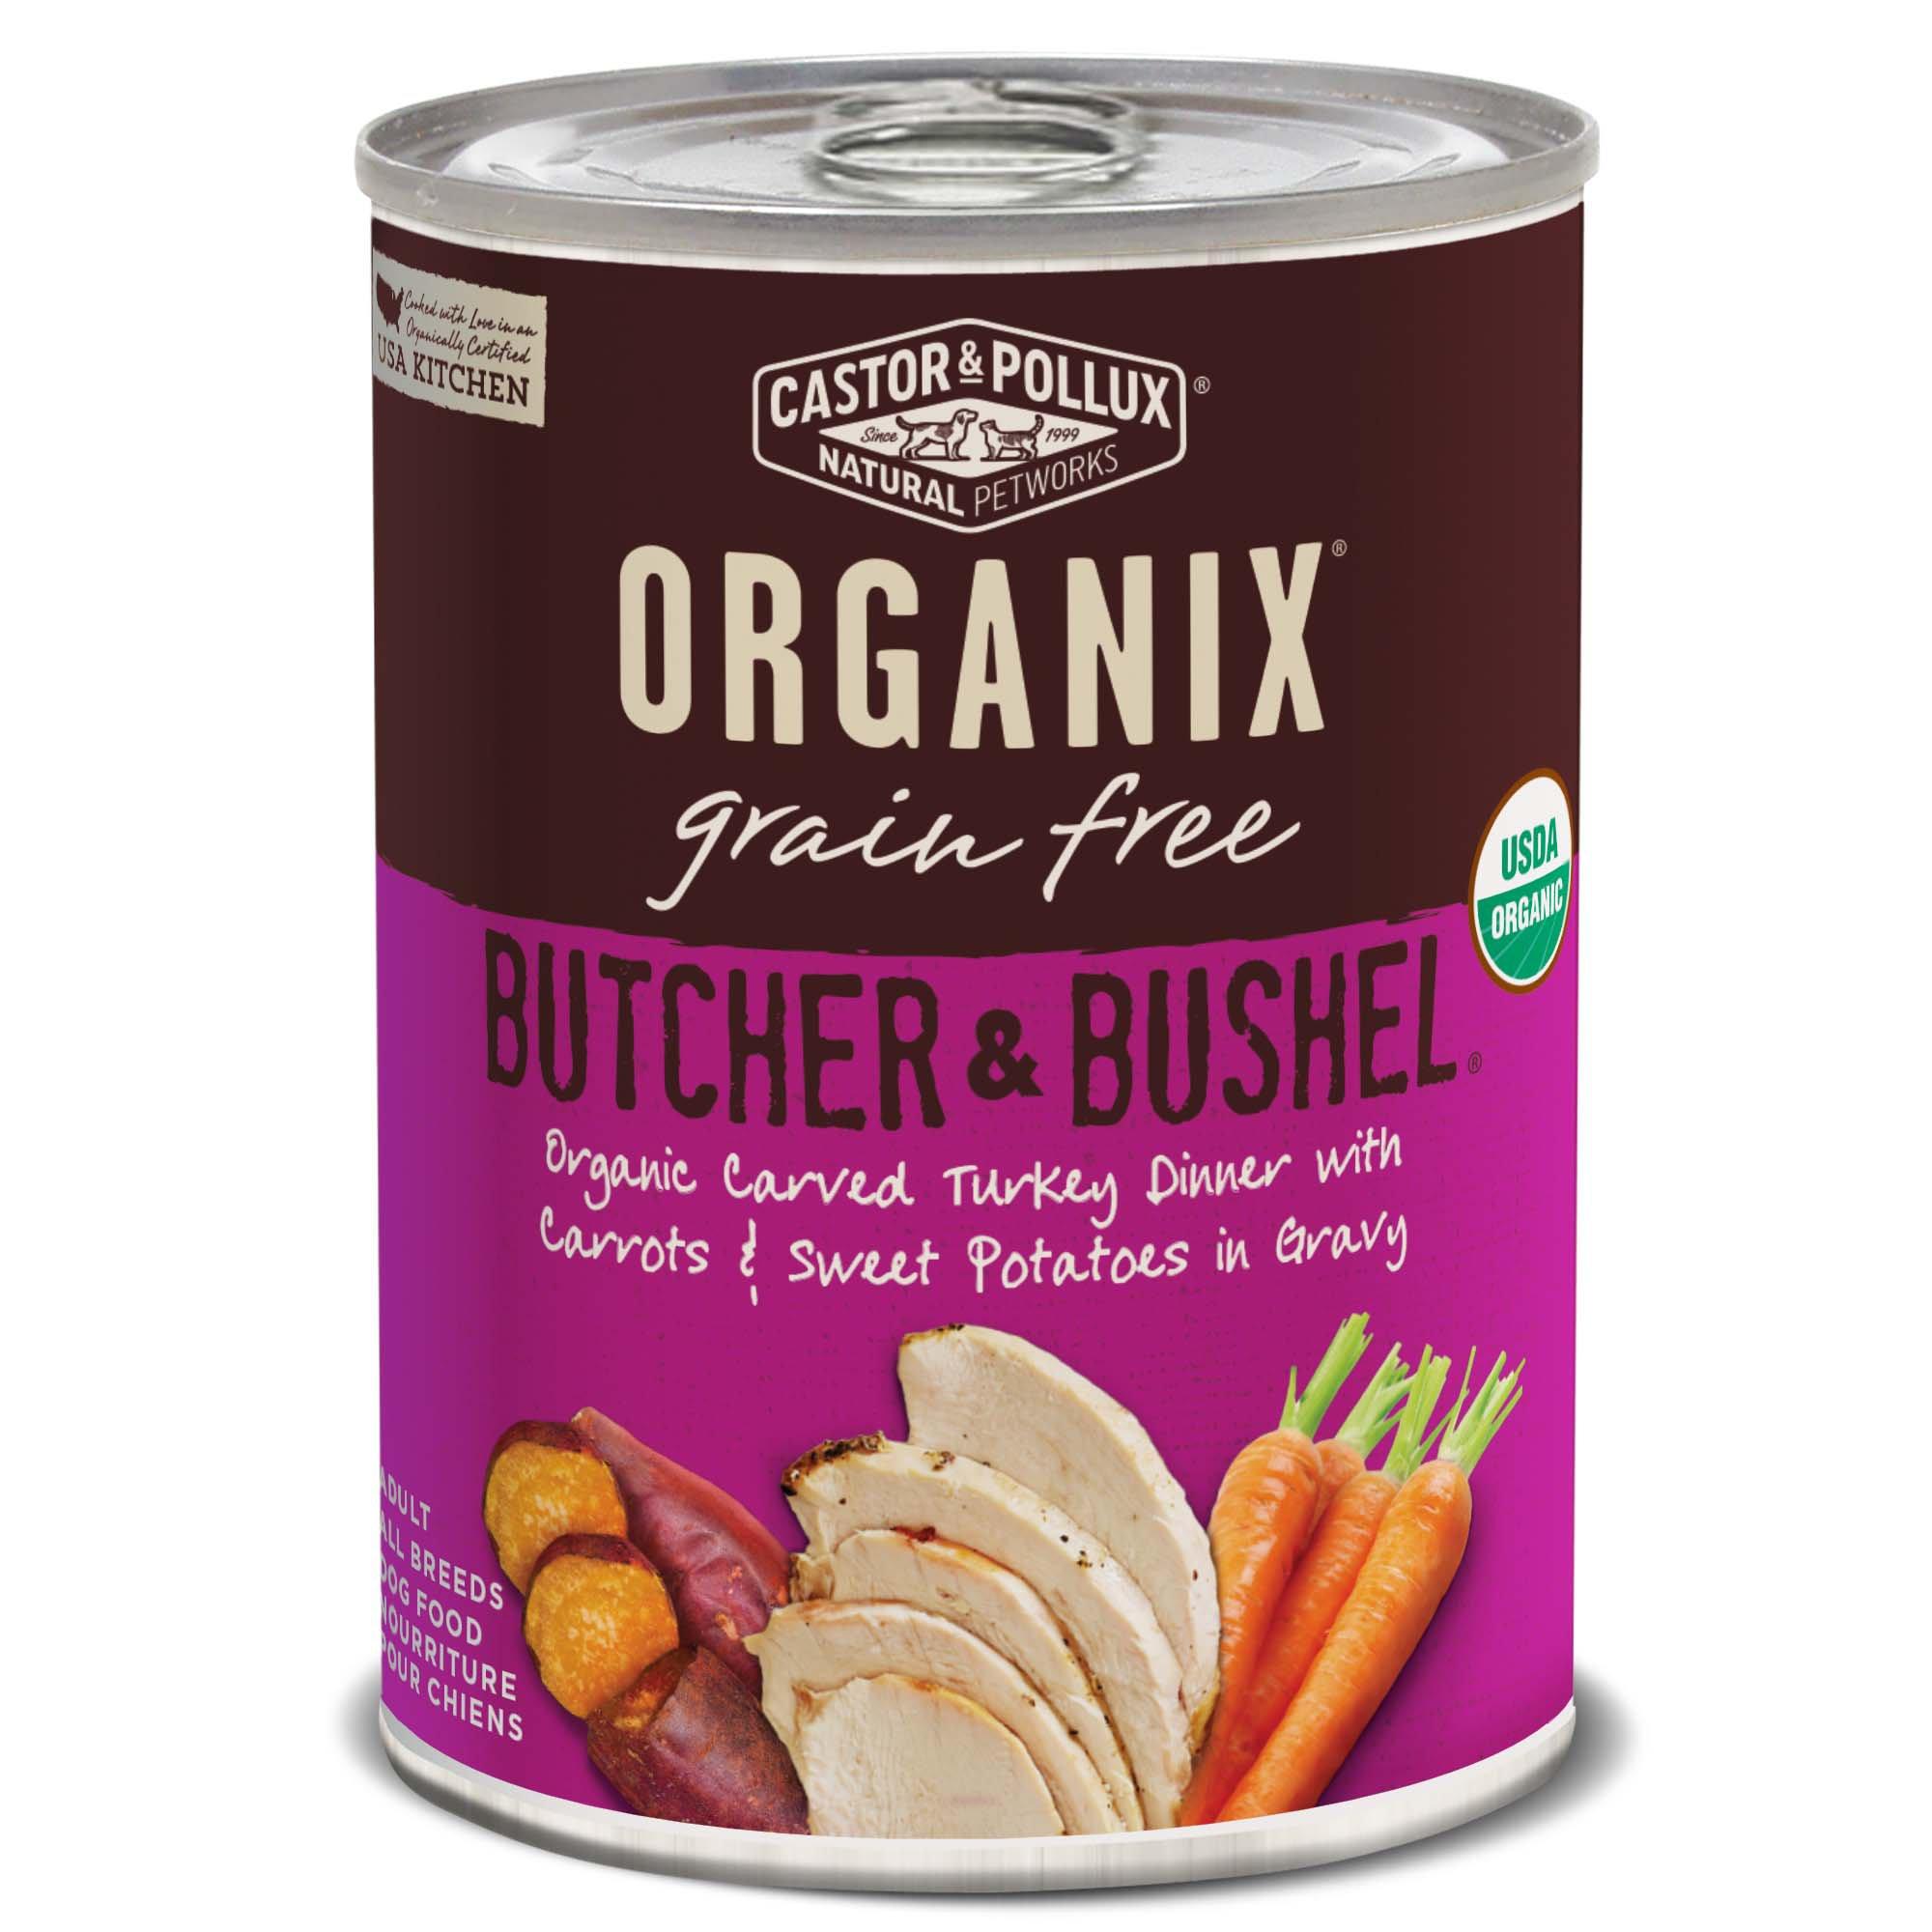 Image of Castor & Pollux Organix Butcher & Bushel Organic Carved Turkey Dinner Wet Dog Food, 12.7oz.,Case of 12, 12 X 12.7 OZ